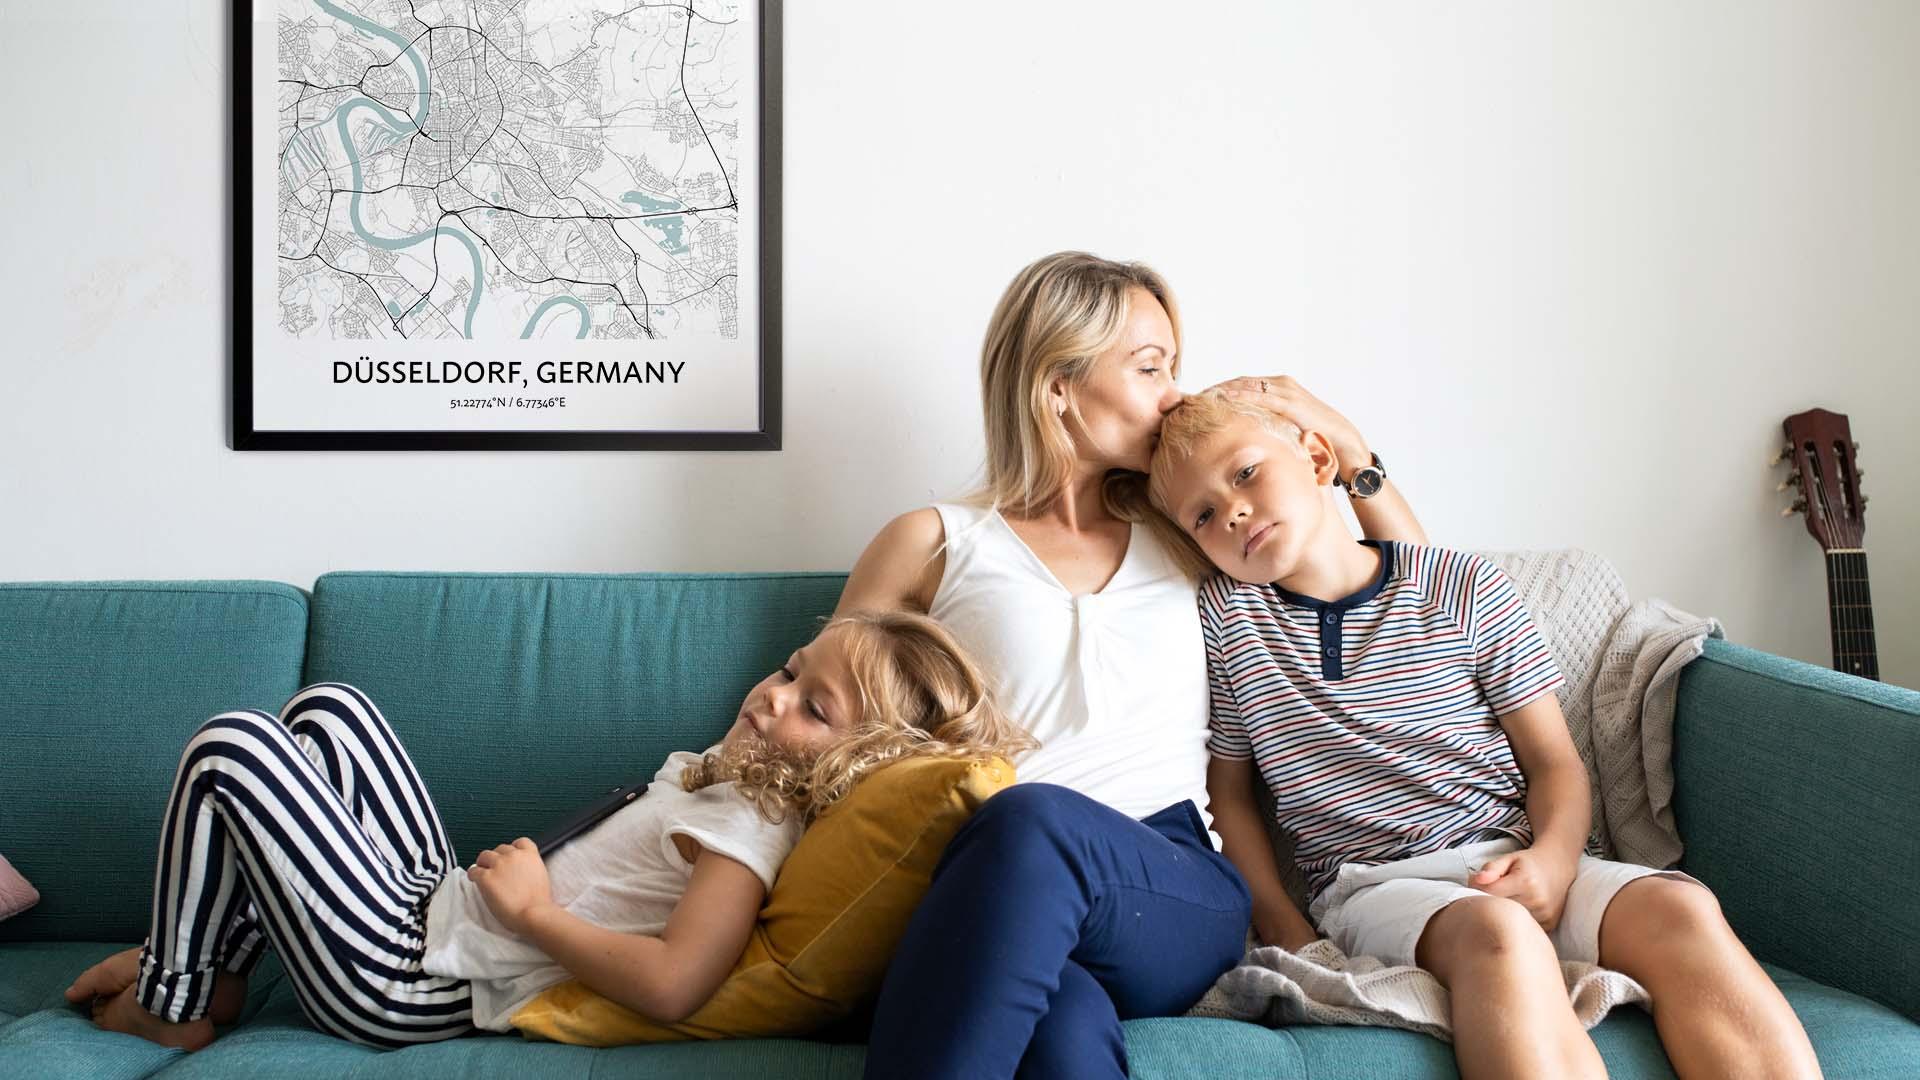 Dusseldorf map poster